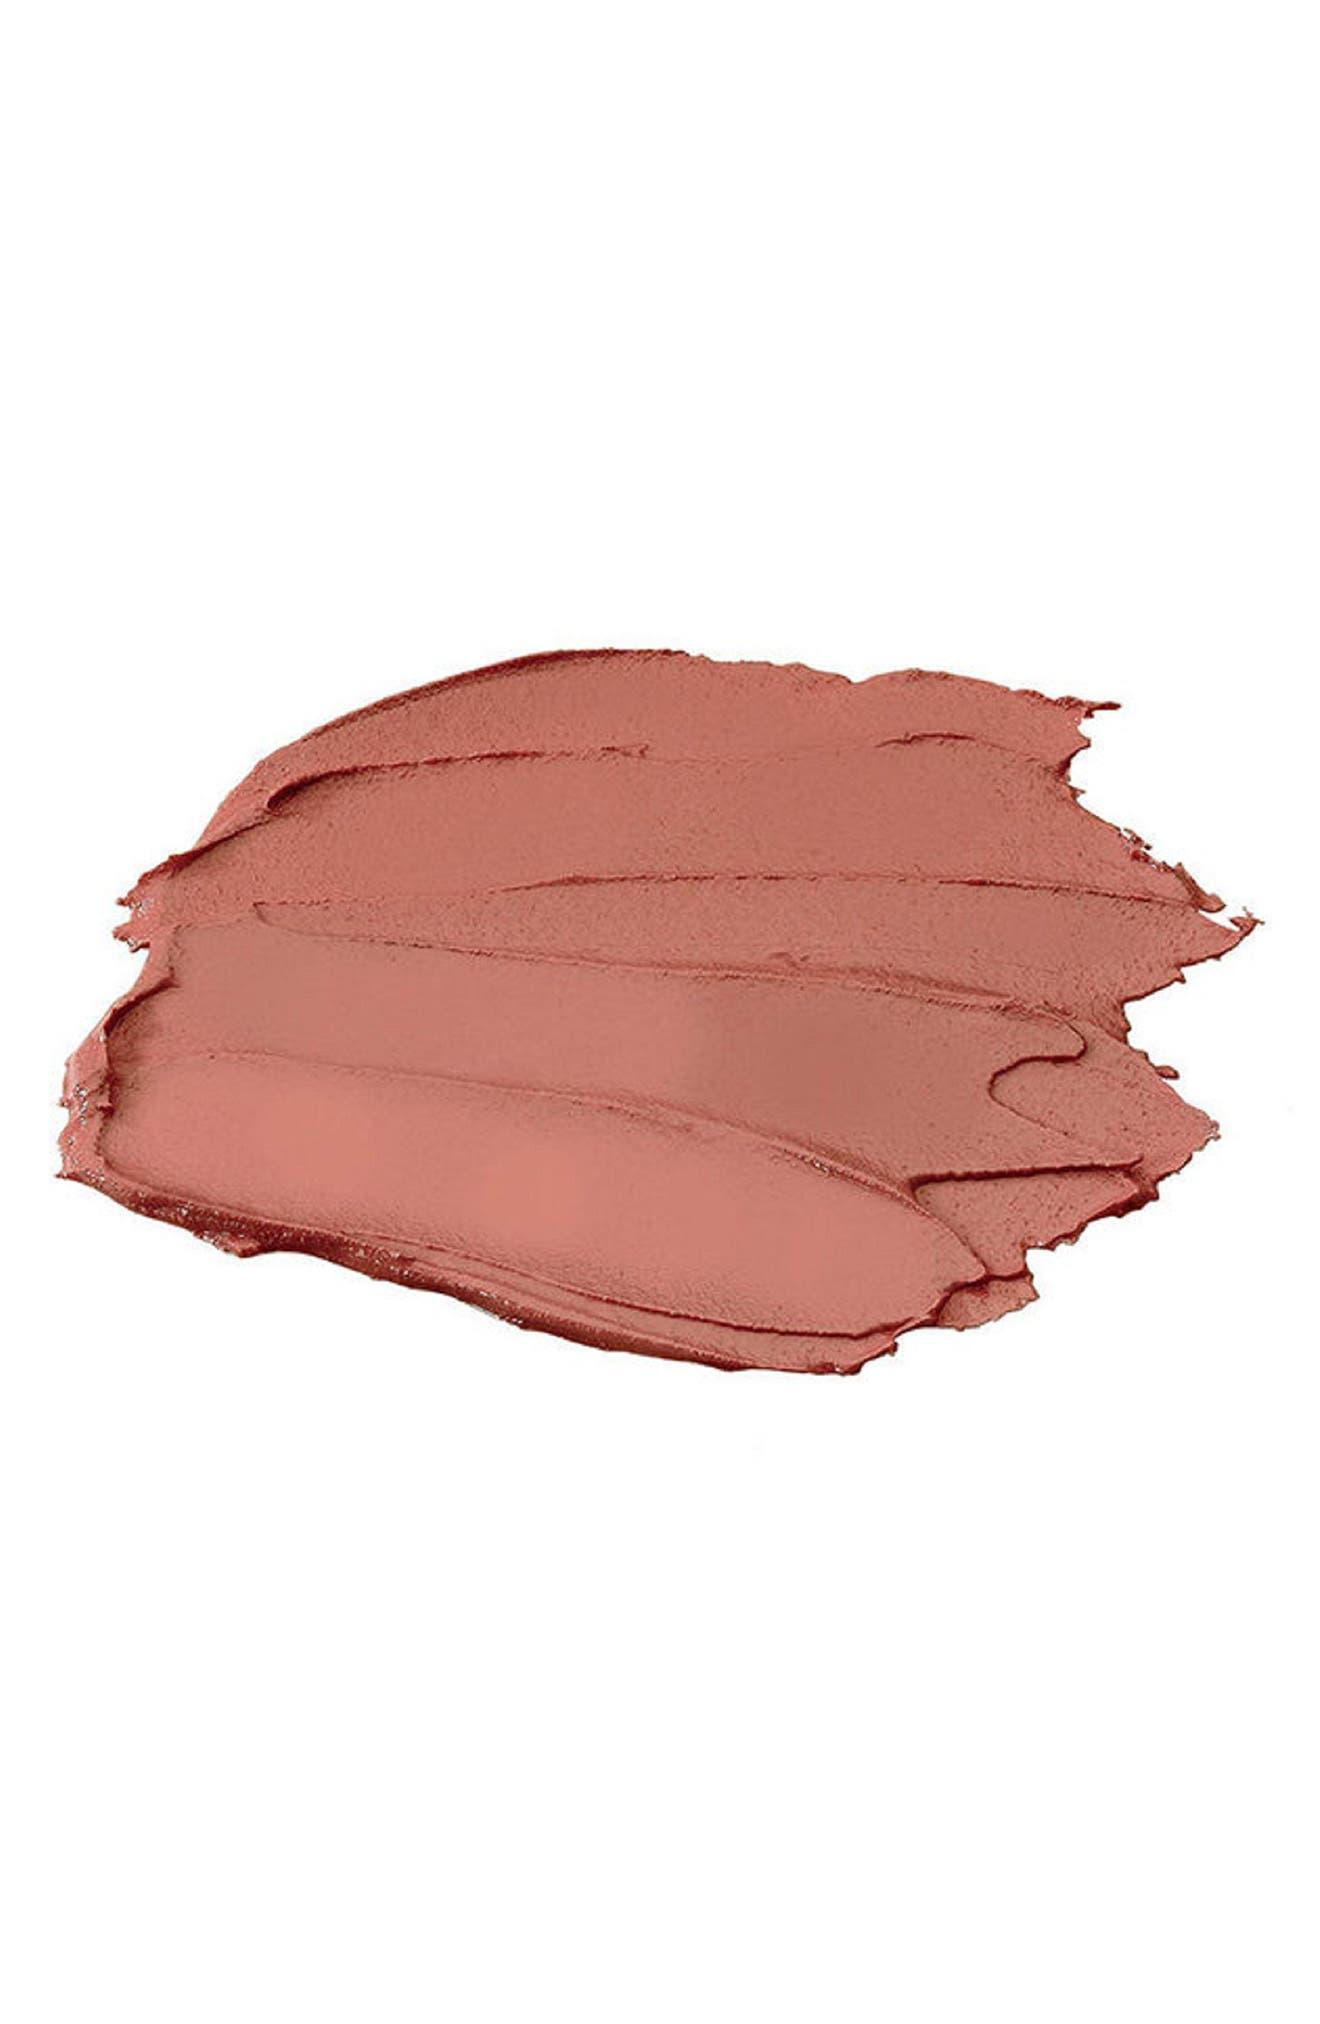 Convertible Color Dual Lip & Cheek Cream,                             Alternate thumbnail 3, color,                             MAGNOLIA